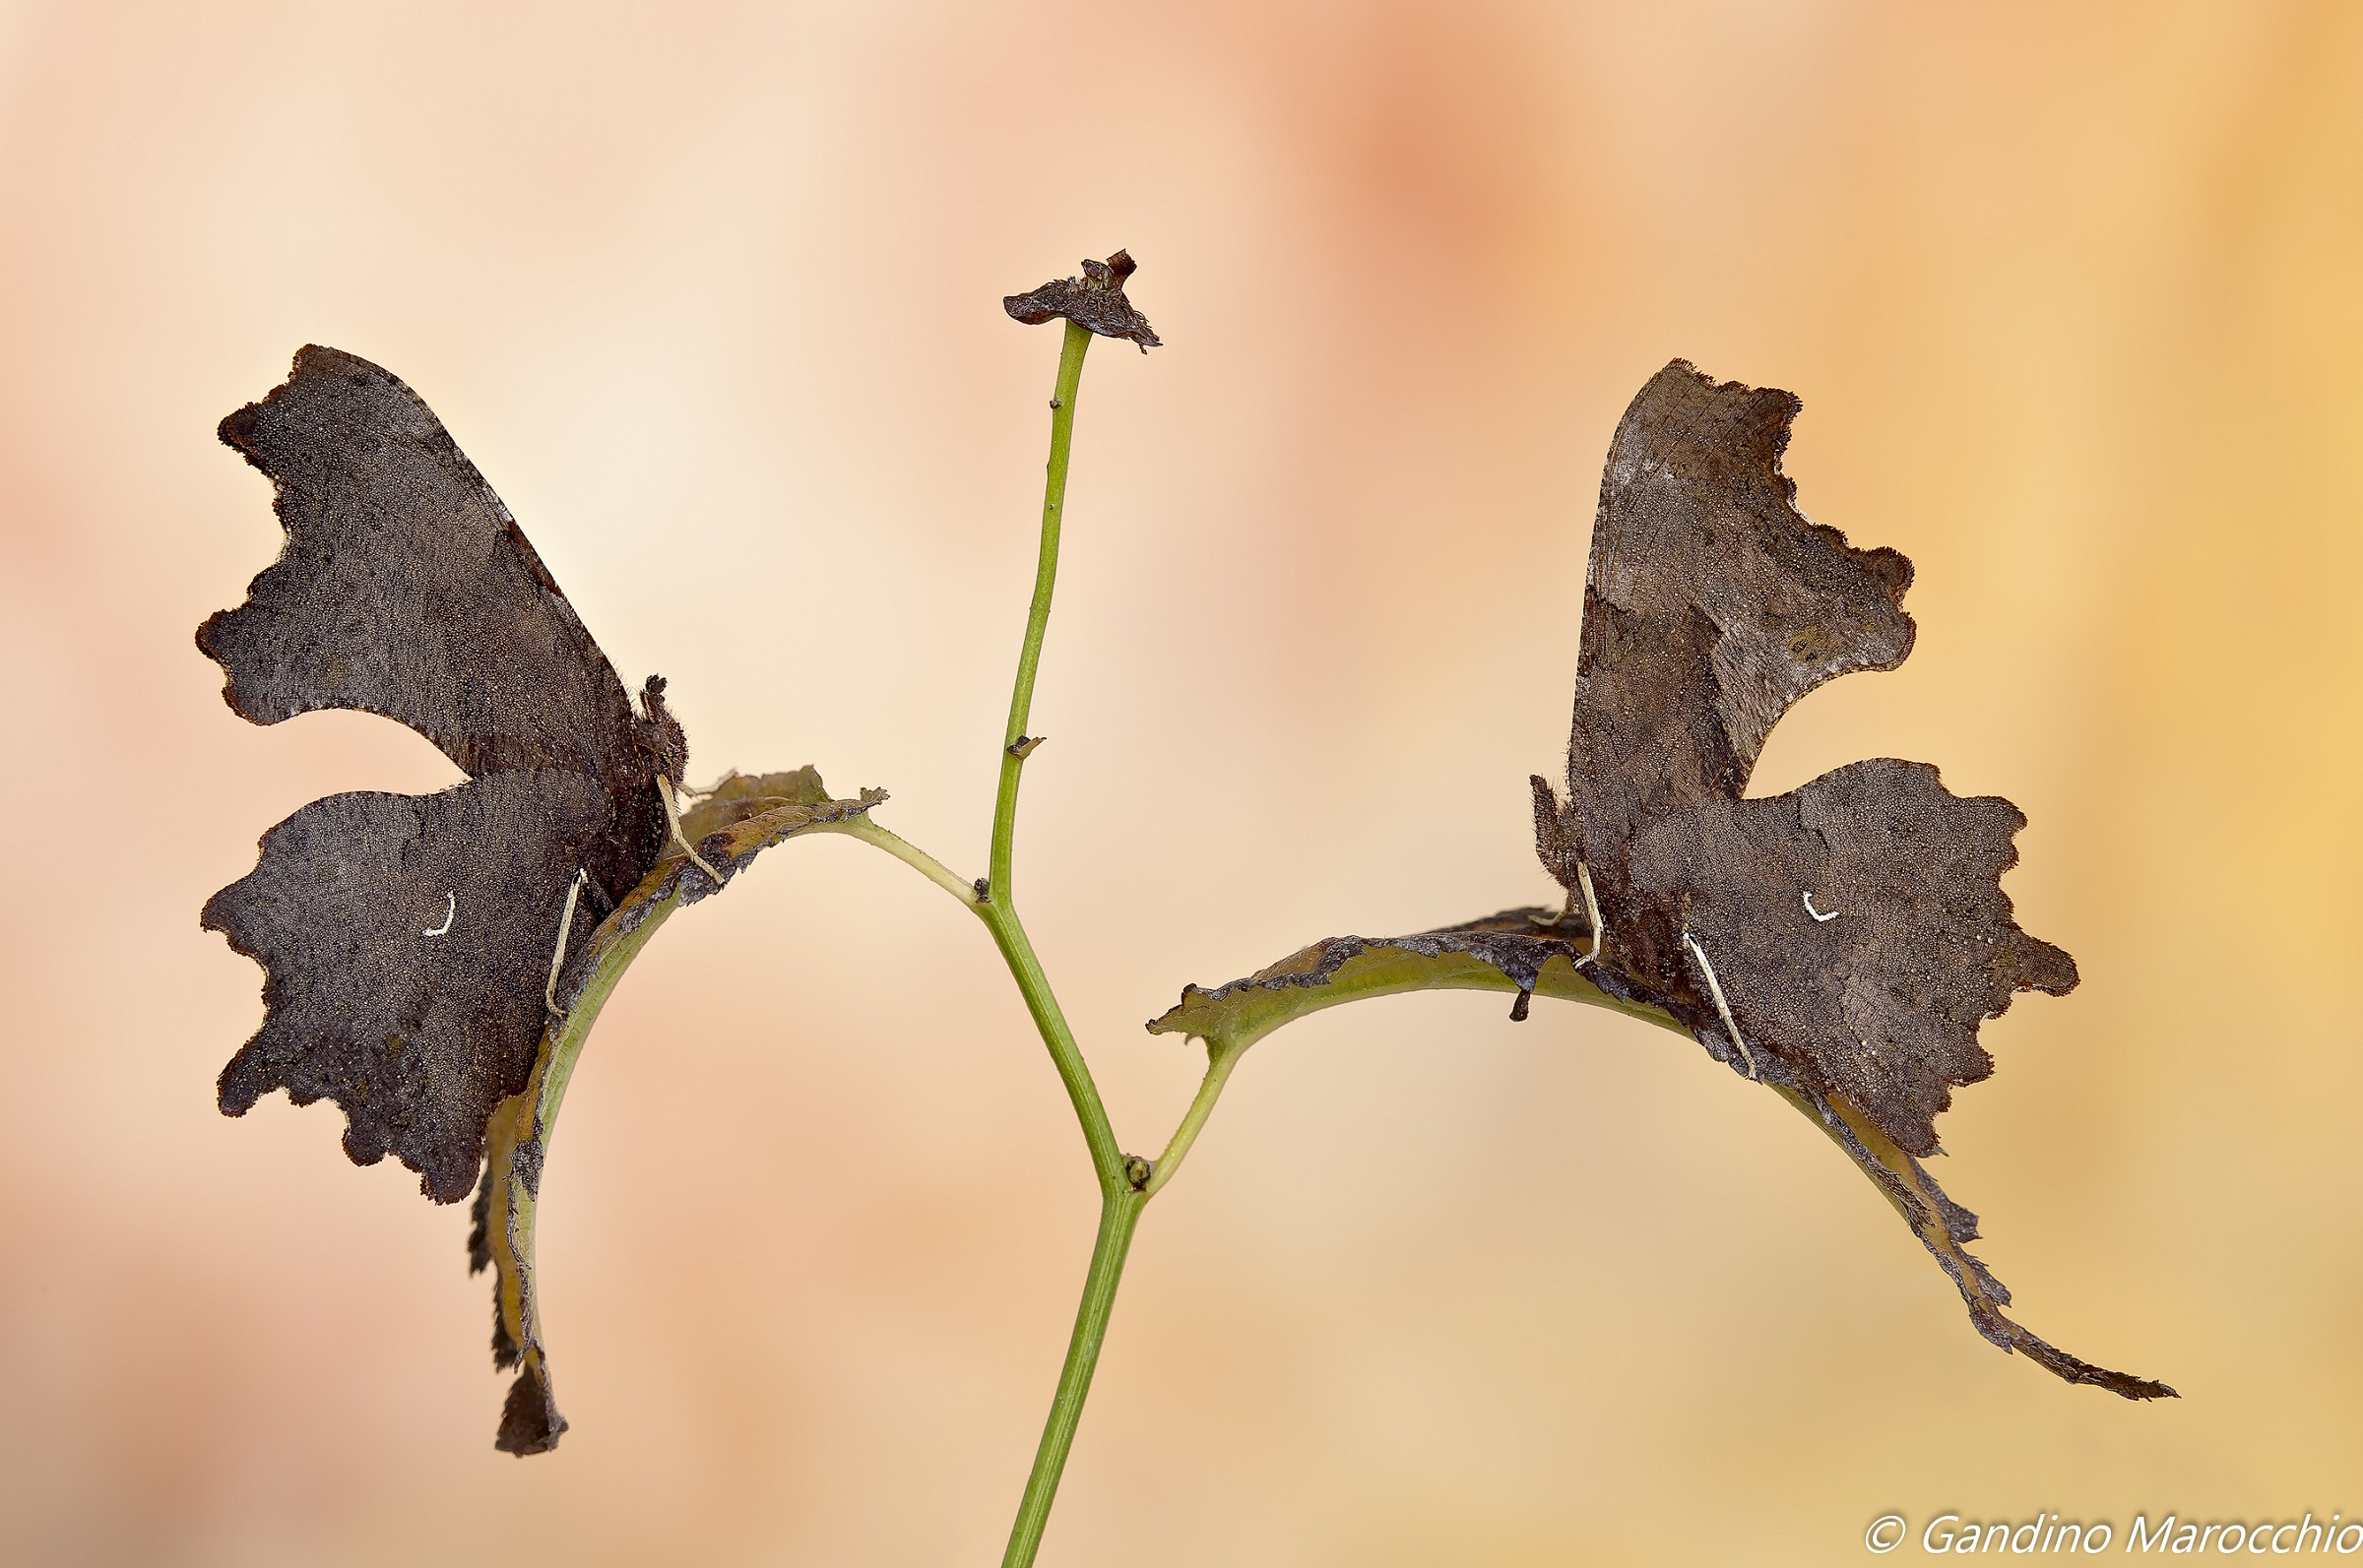 The two leaves (polygonia c-album)...